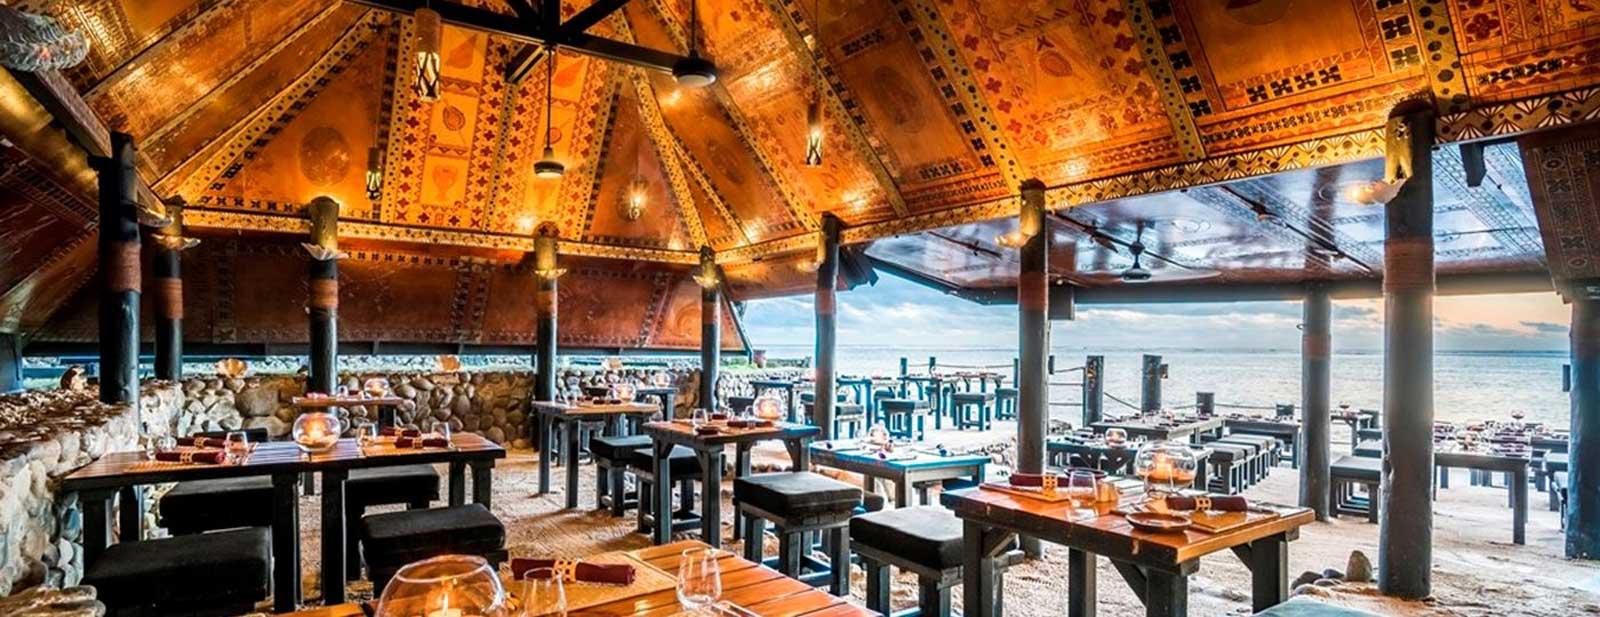 HEADER-fine-dining-restaurants-coral-coast